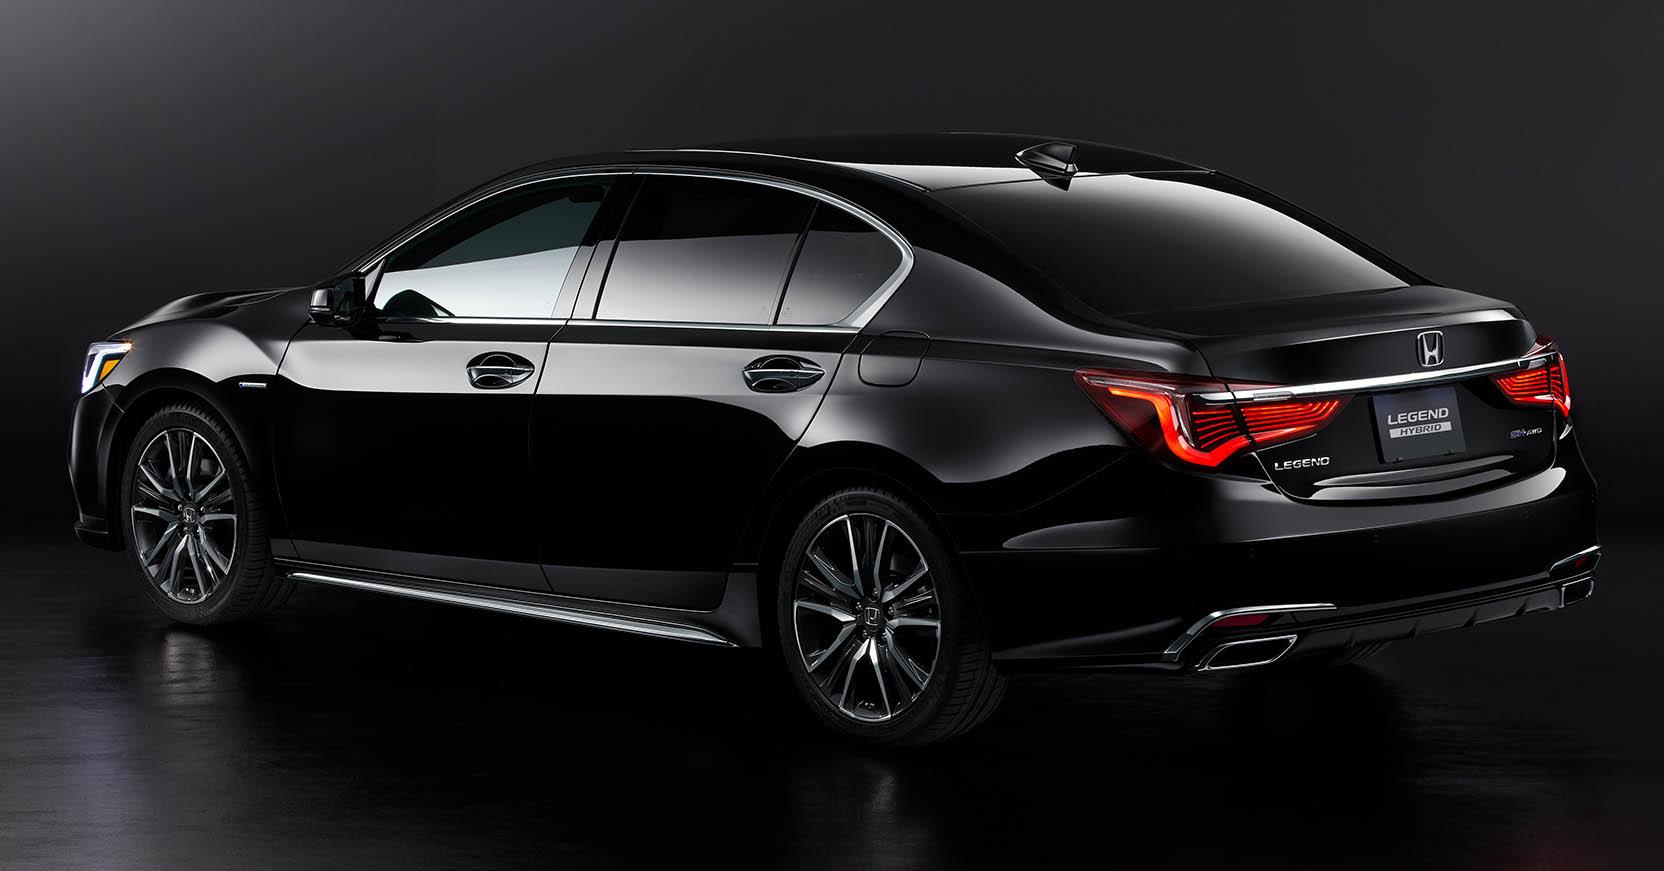 2019 Peugeot 508 Unveiled Photos And Details Car Talk